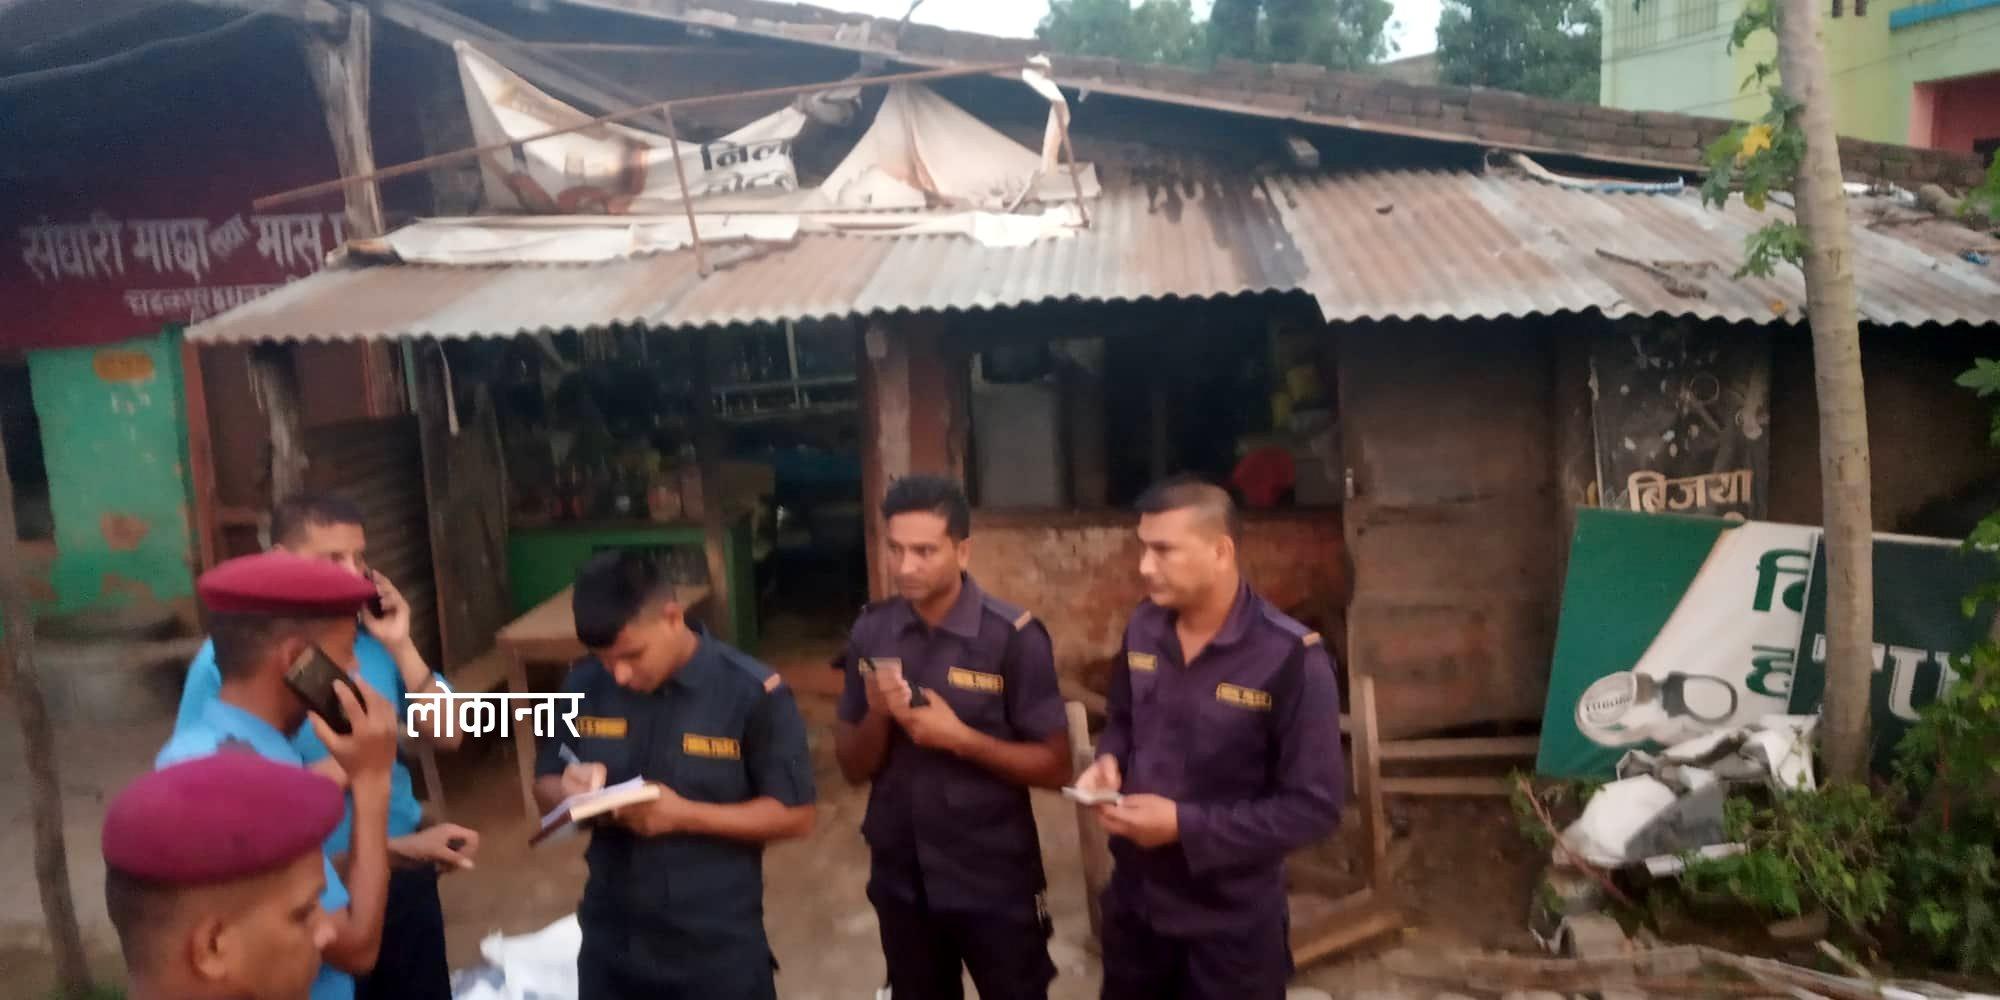 धनगढीमा 'टिफिन बम' विस्फोट : शंकाको सुई विप्लव समूहतर्फ, मृतक रामबहादुरले बोकेका थिए बम !